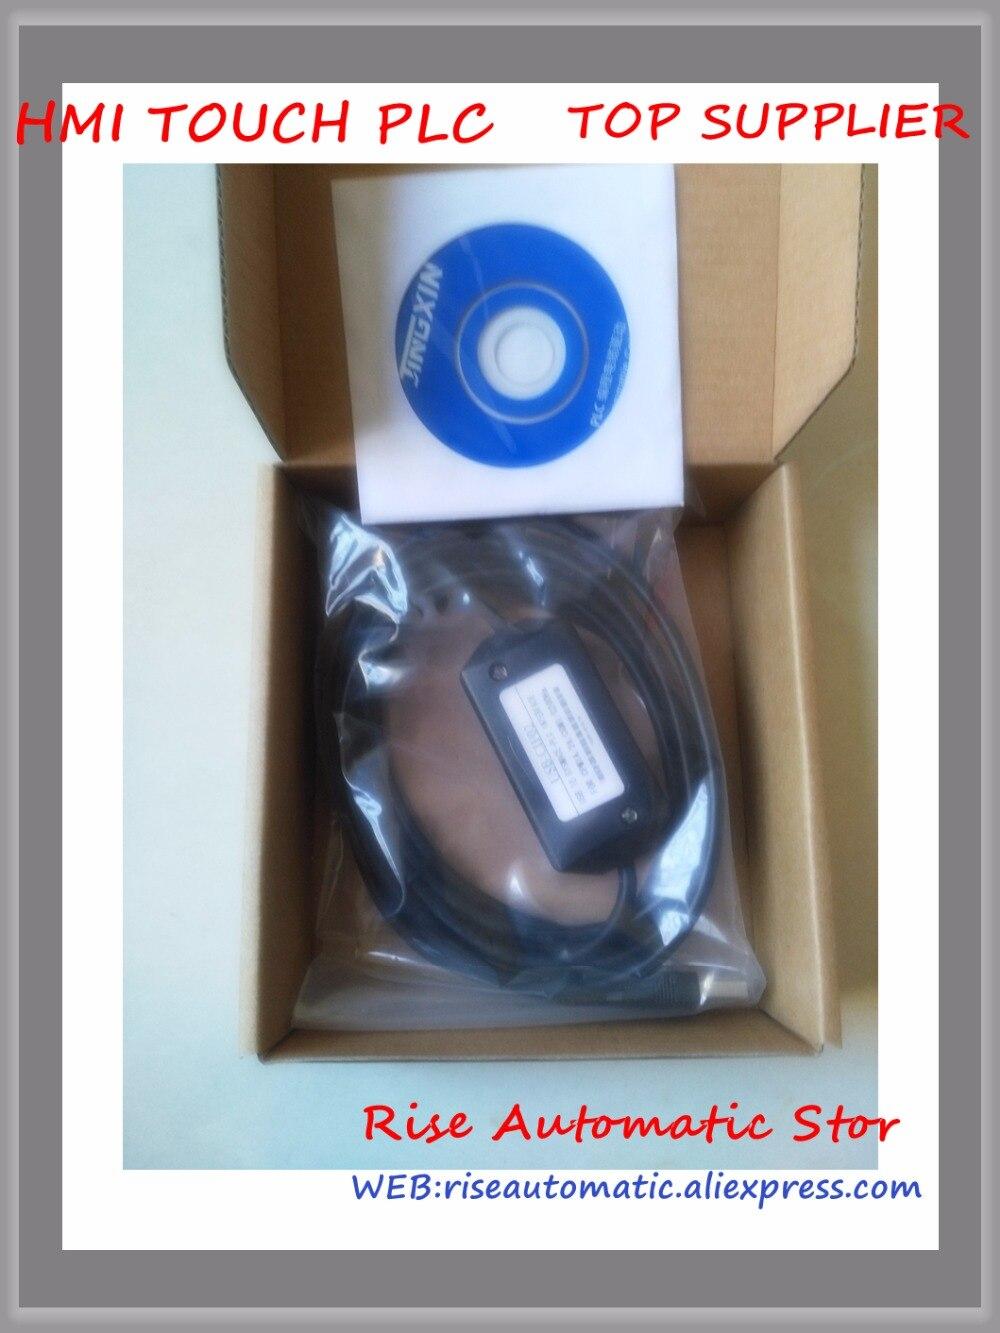 USB-CIF02 PLC Cable USBCIF02 for CPM1/CPM1A/2A/CQM1/C200HS/C200HX/HG/HE and SRM1 PLC USB CIF02 USB/CIF02 Support Win7/Win8